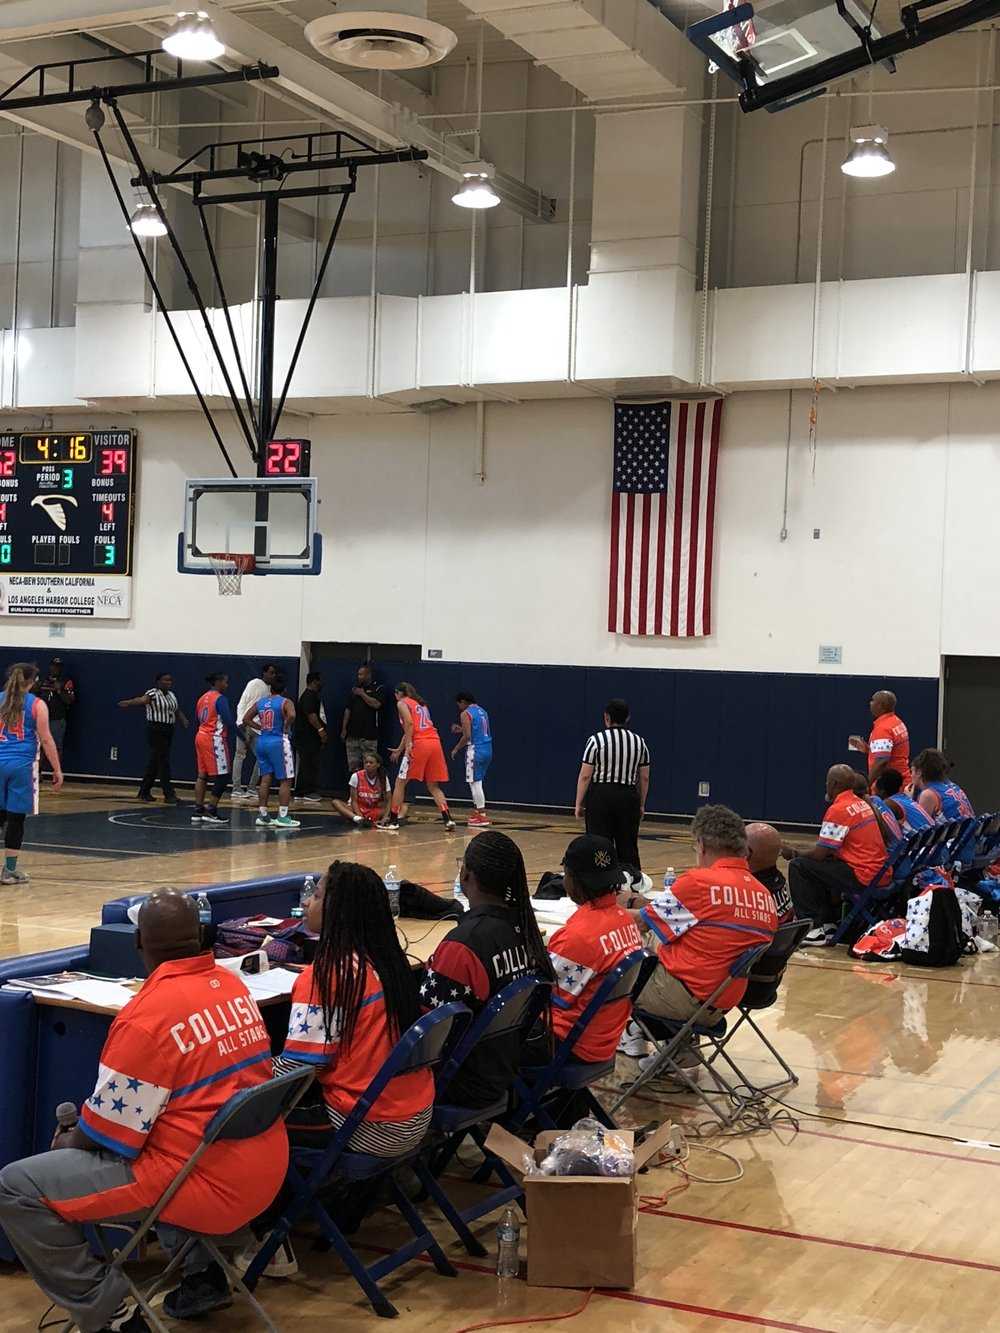 Women's COLLISION Orange Blue White basketball uniforms, jerseys, and shorts